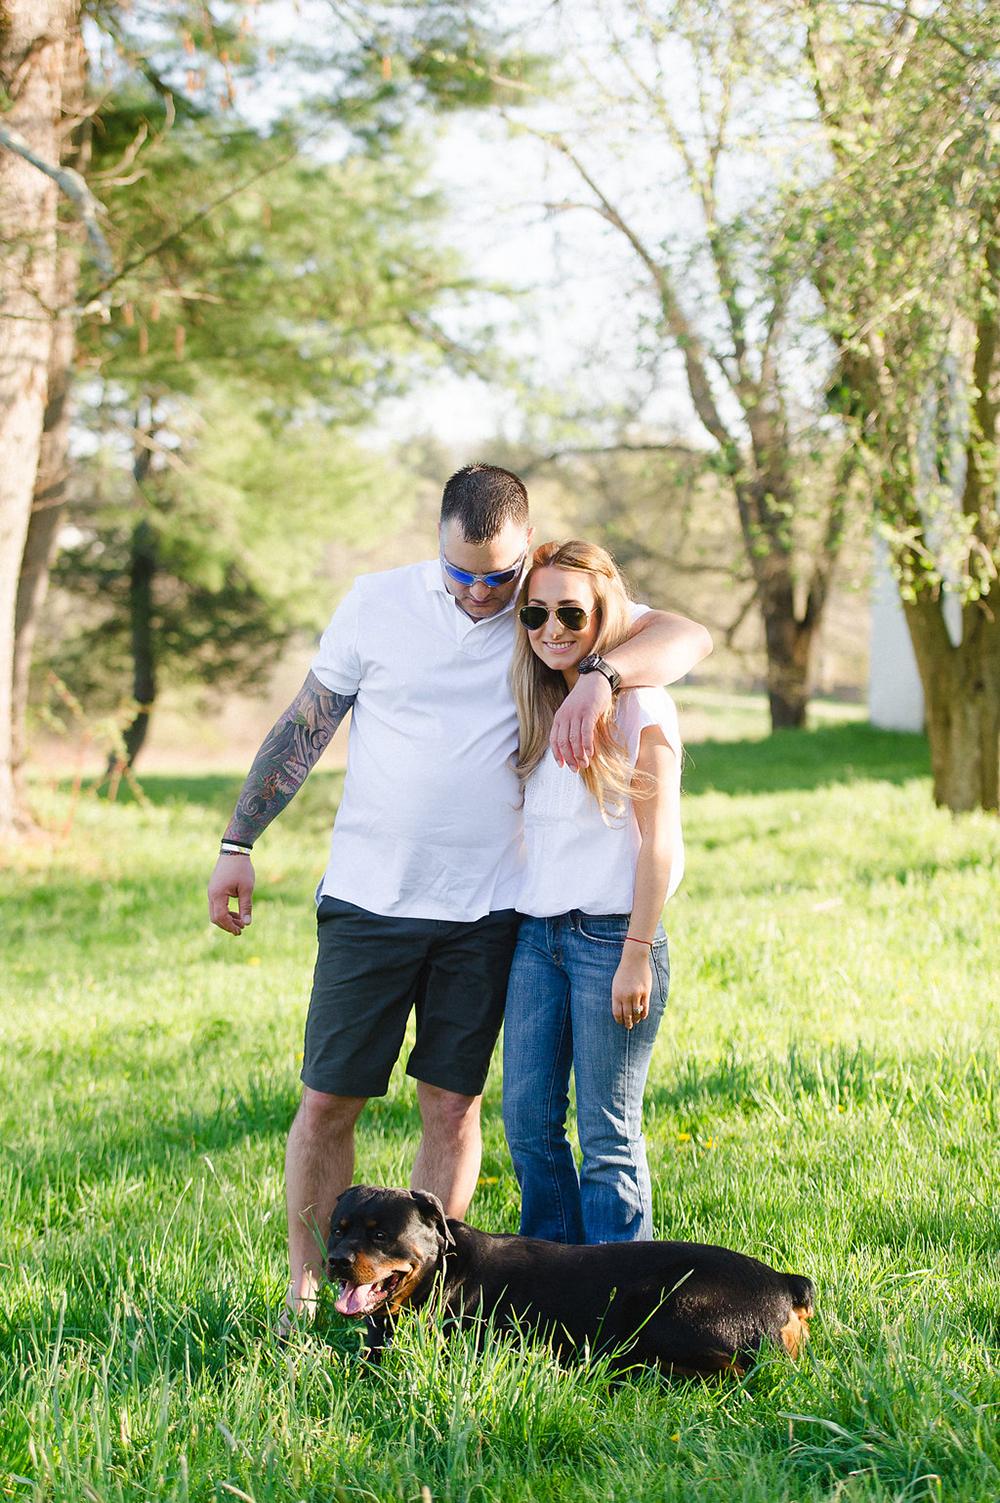 John-Jay-Homestead-Engagement-Photos-Greg-Lewis-Photography-2